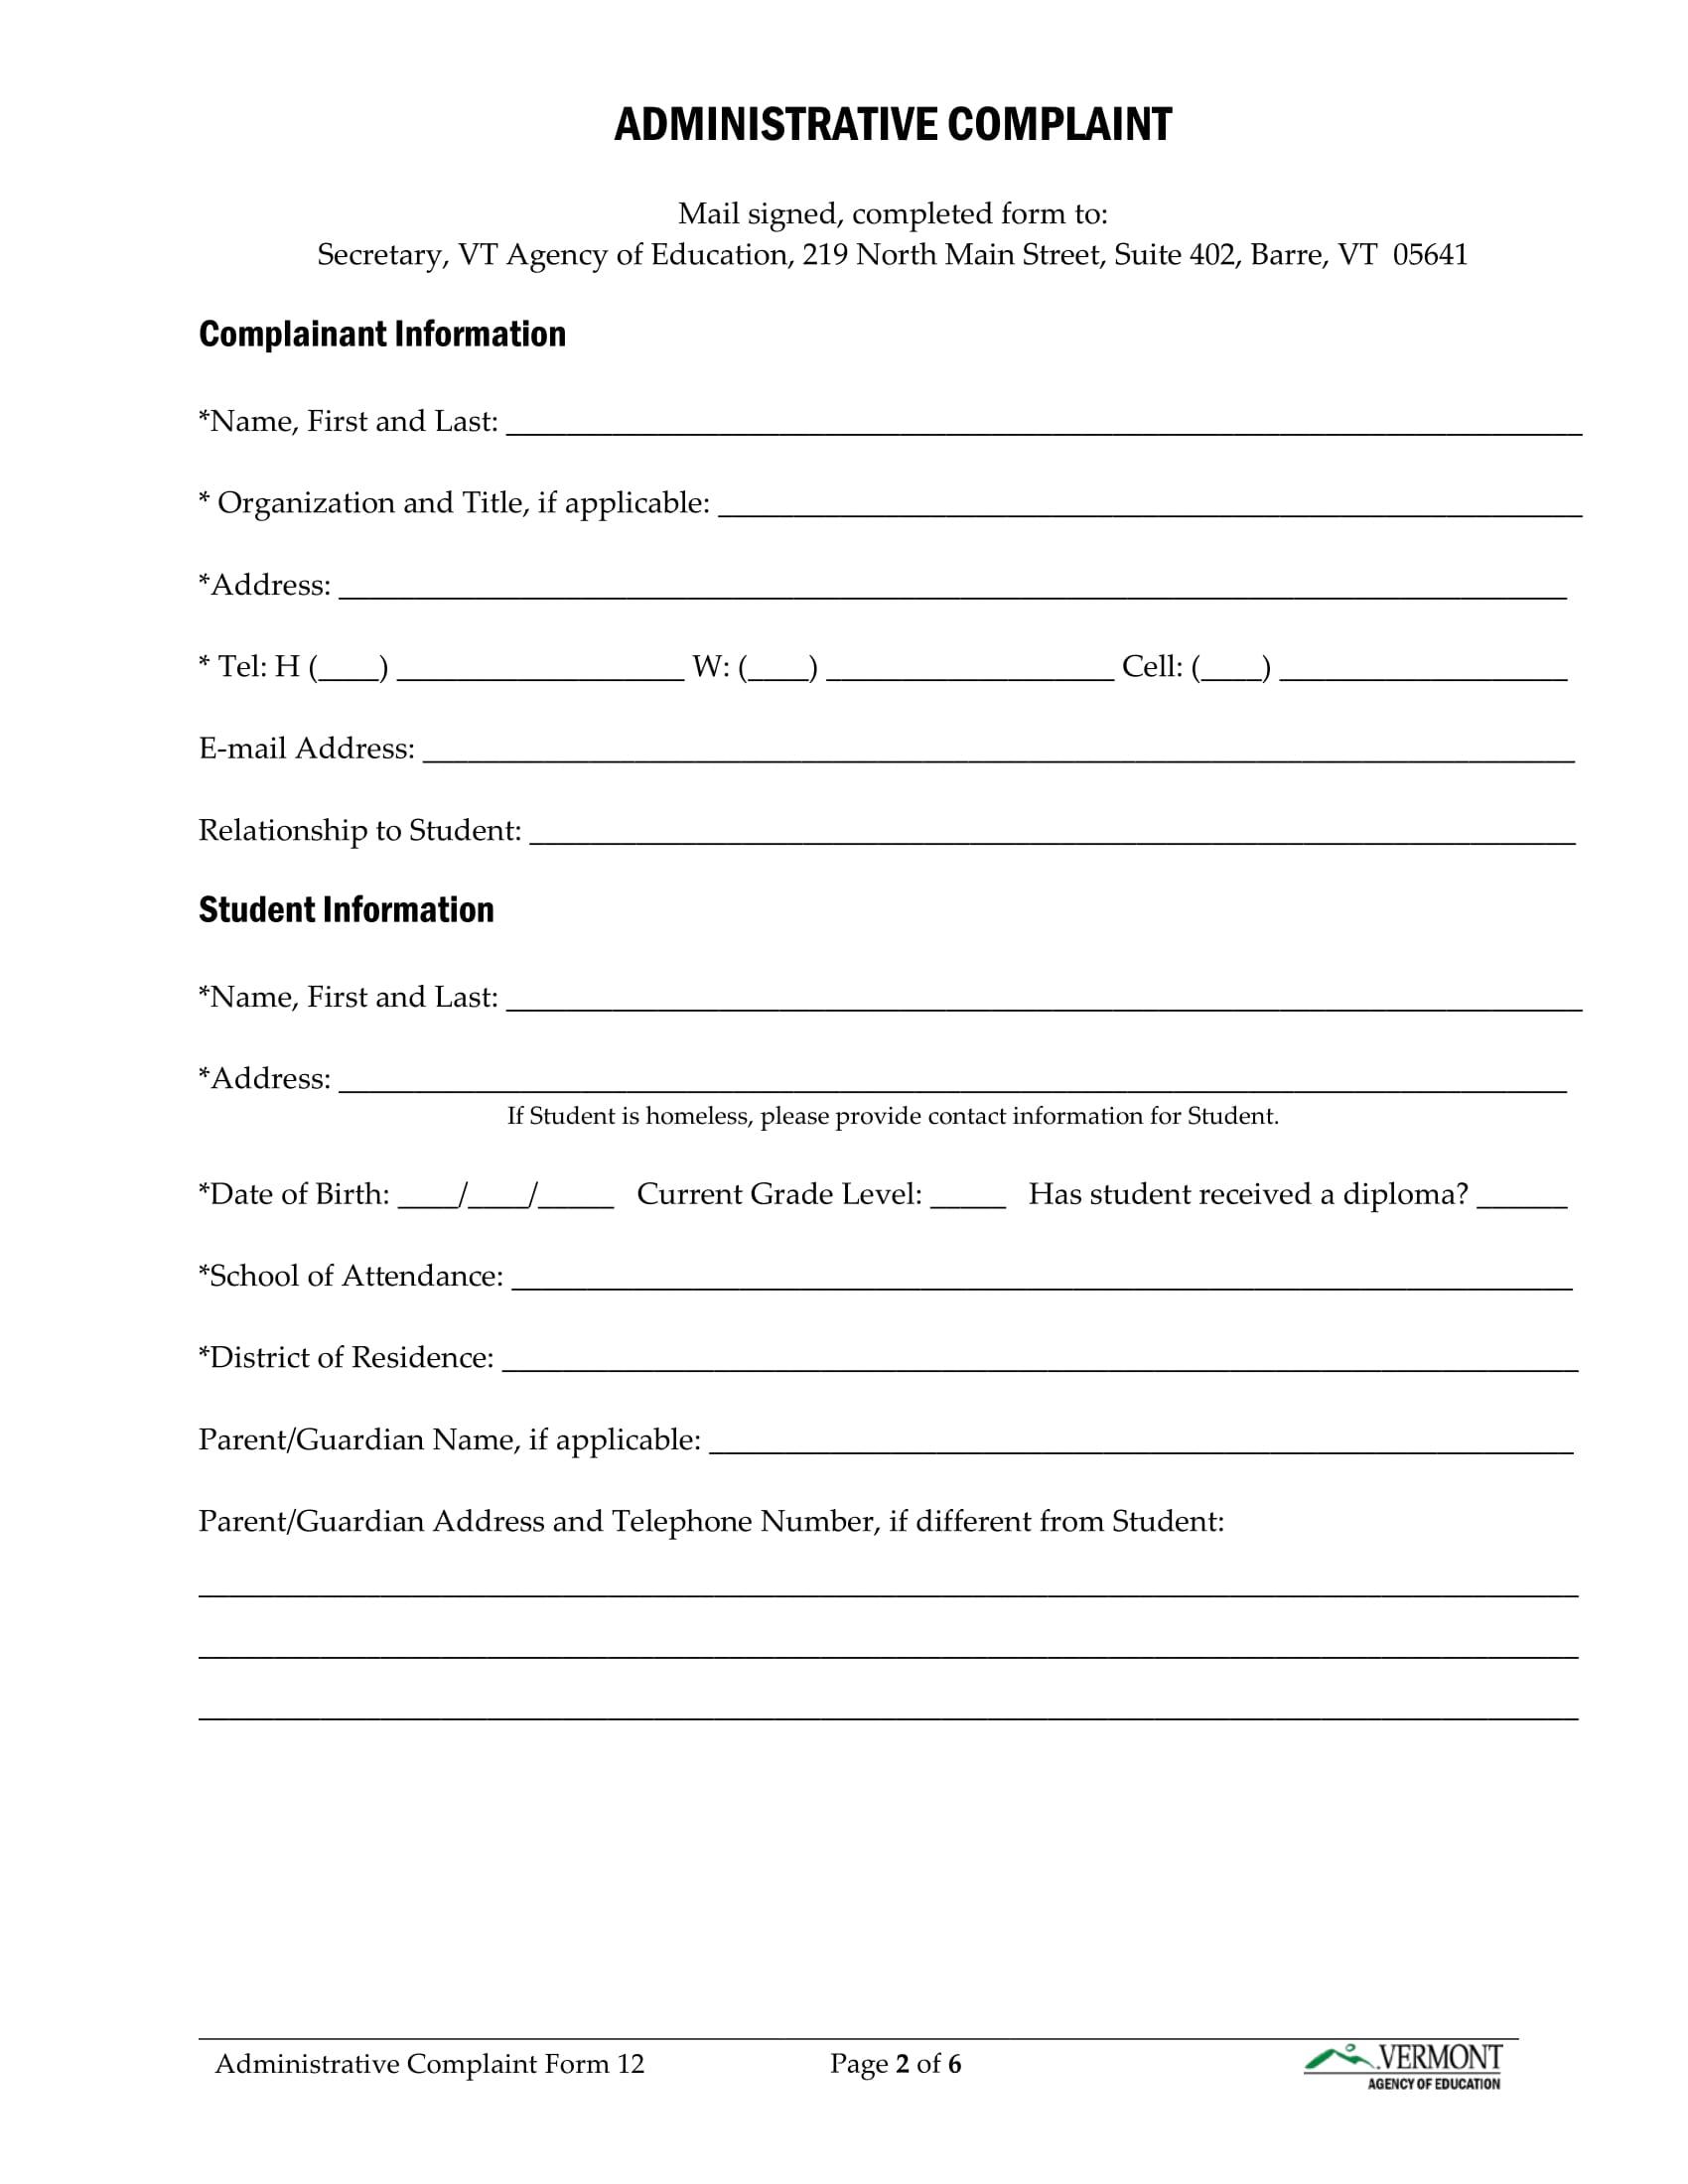 administrative complaint form 2